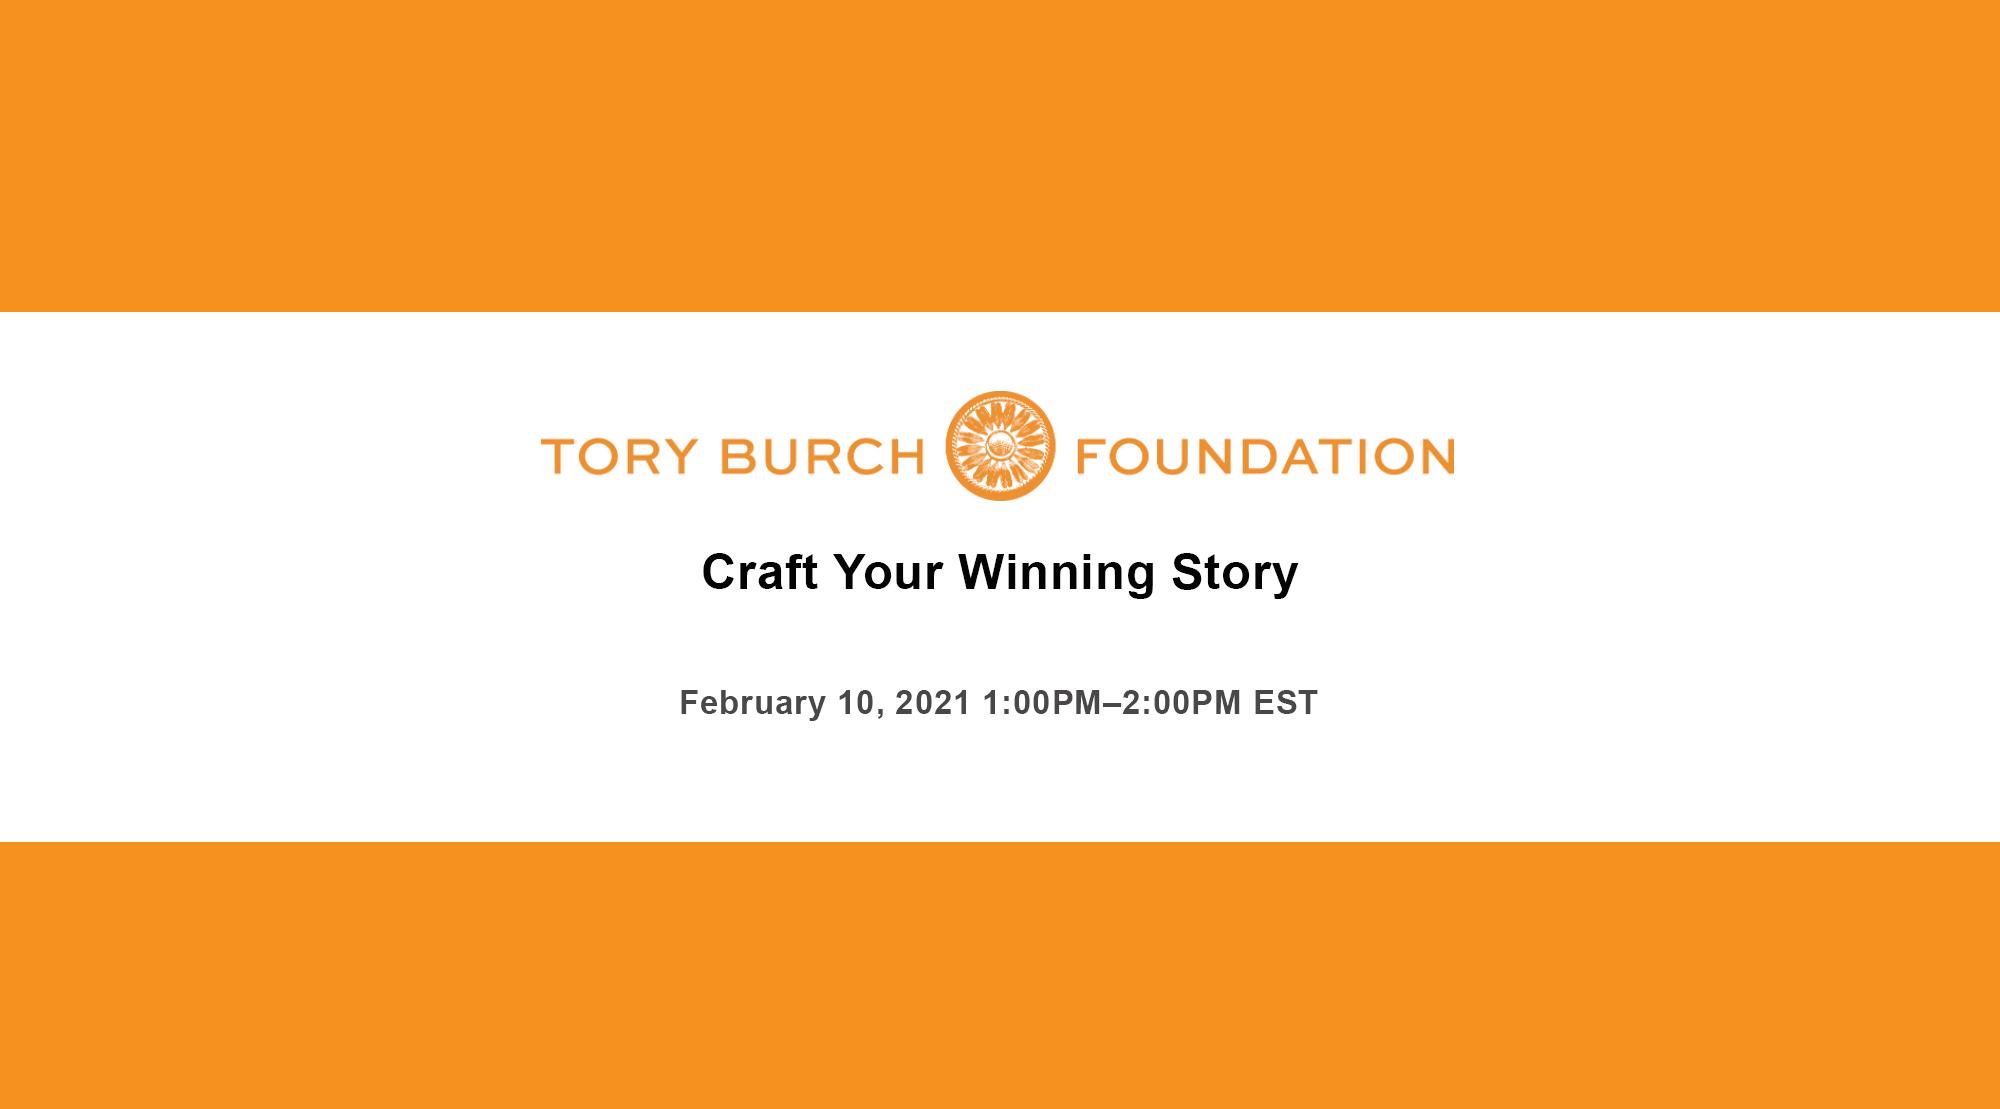 Craft Your Winning Story